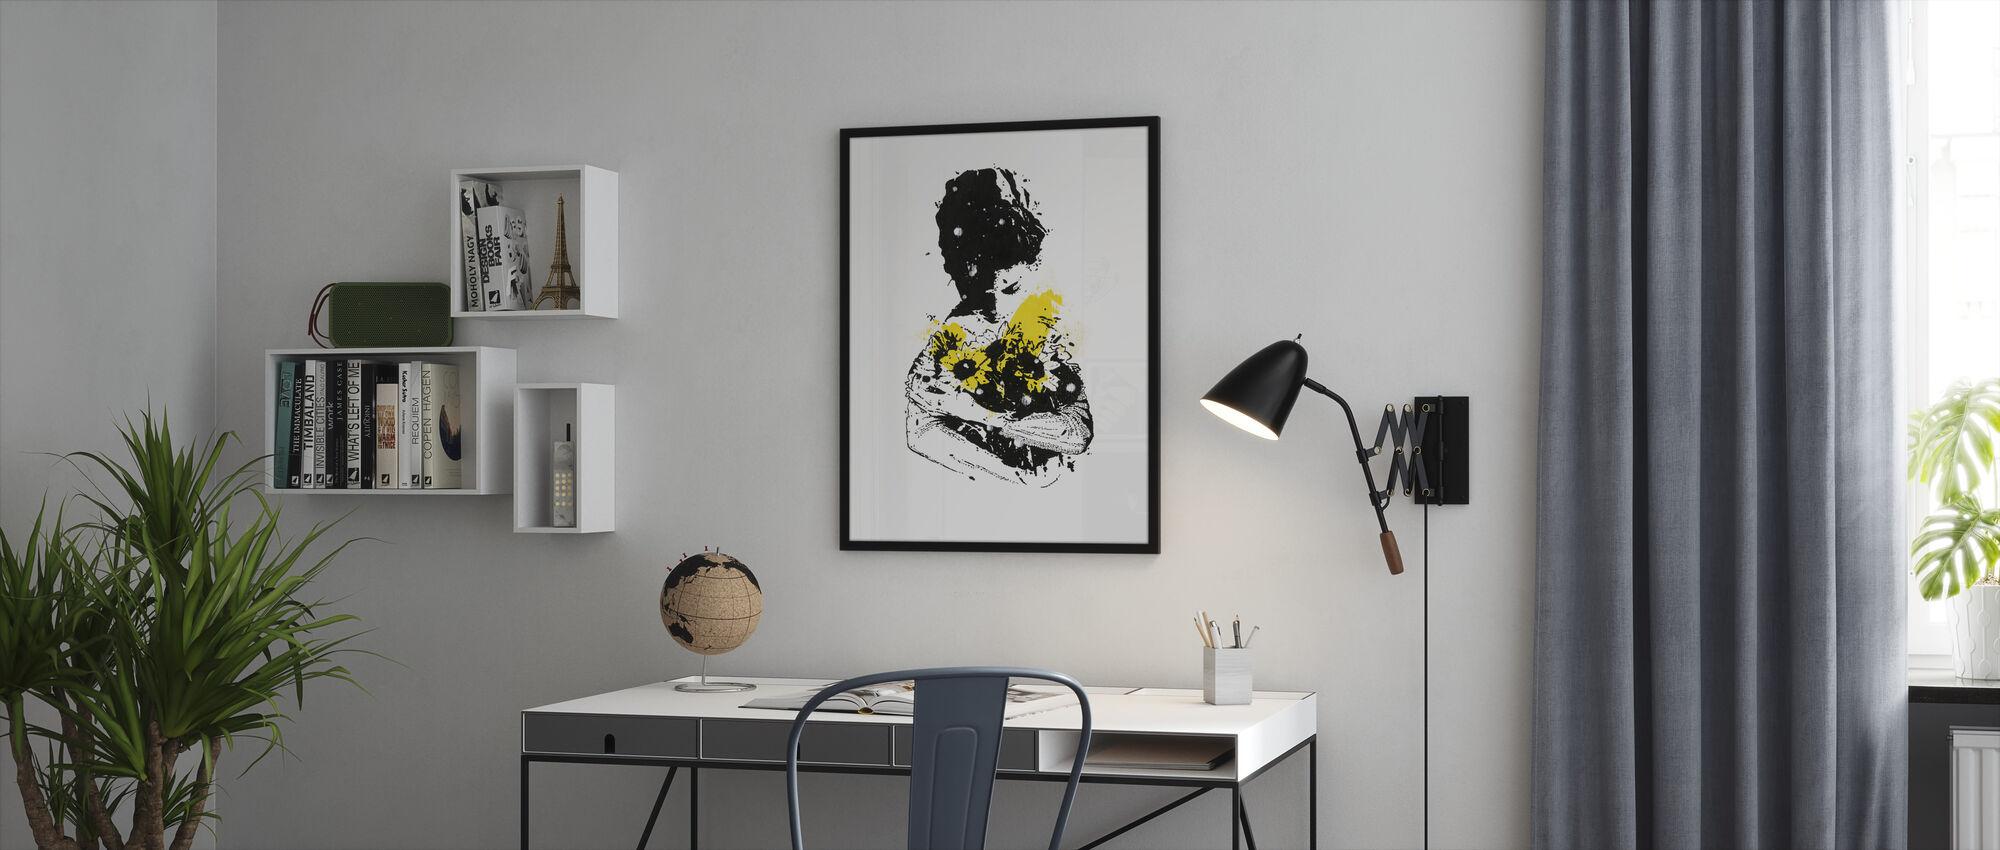 Rioter - Framed print - Office